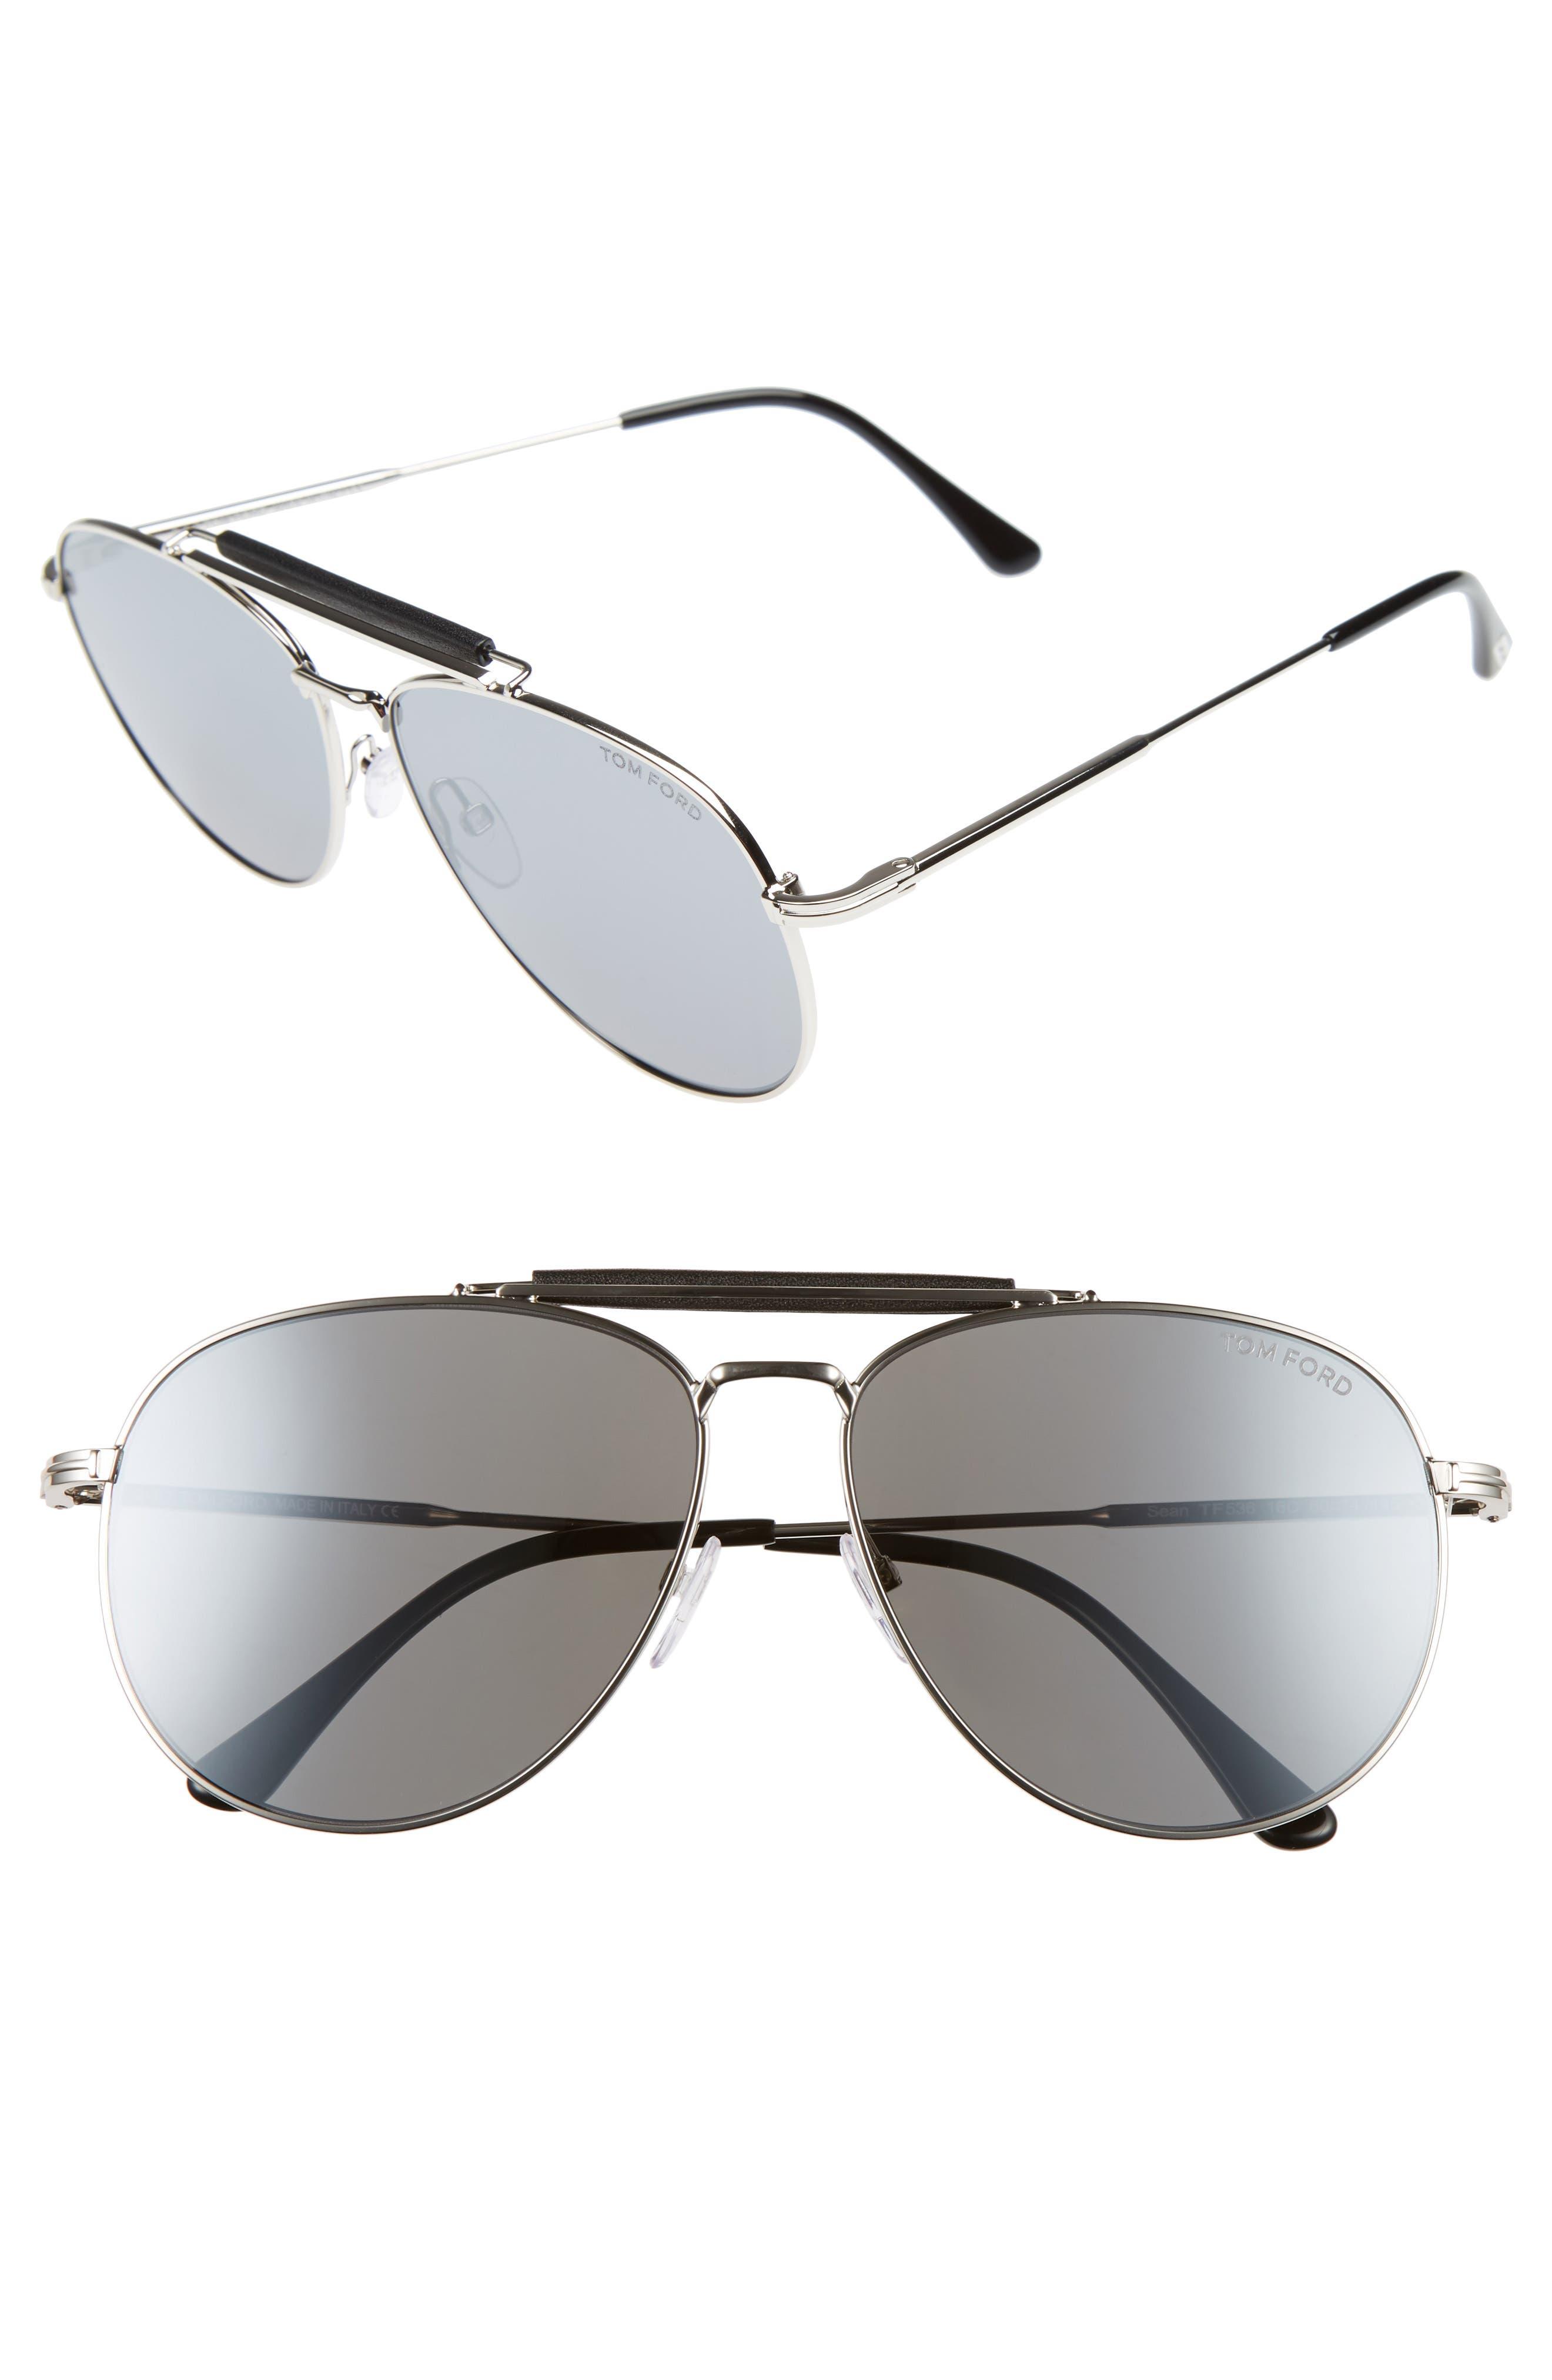 Tom Ford Sean 61mm Aviator Sunglasses